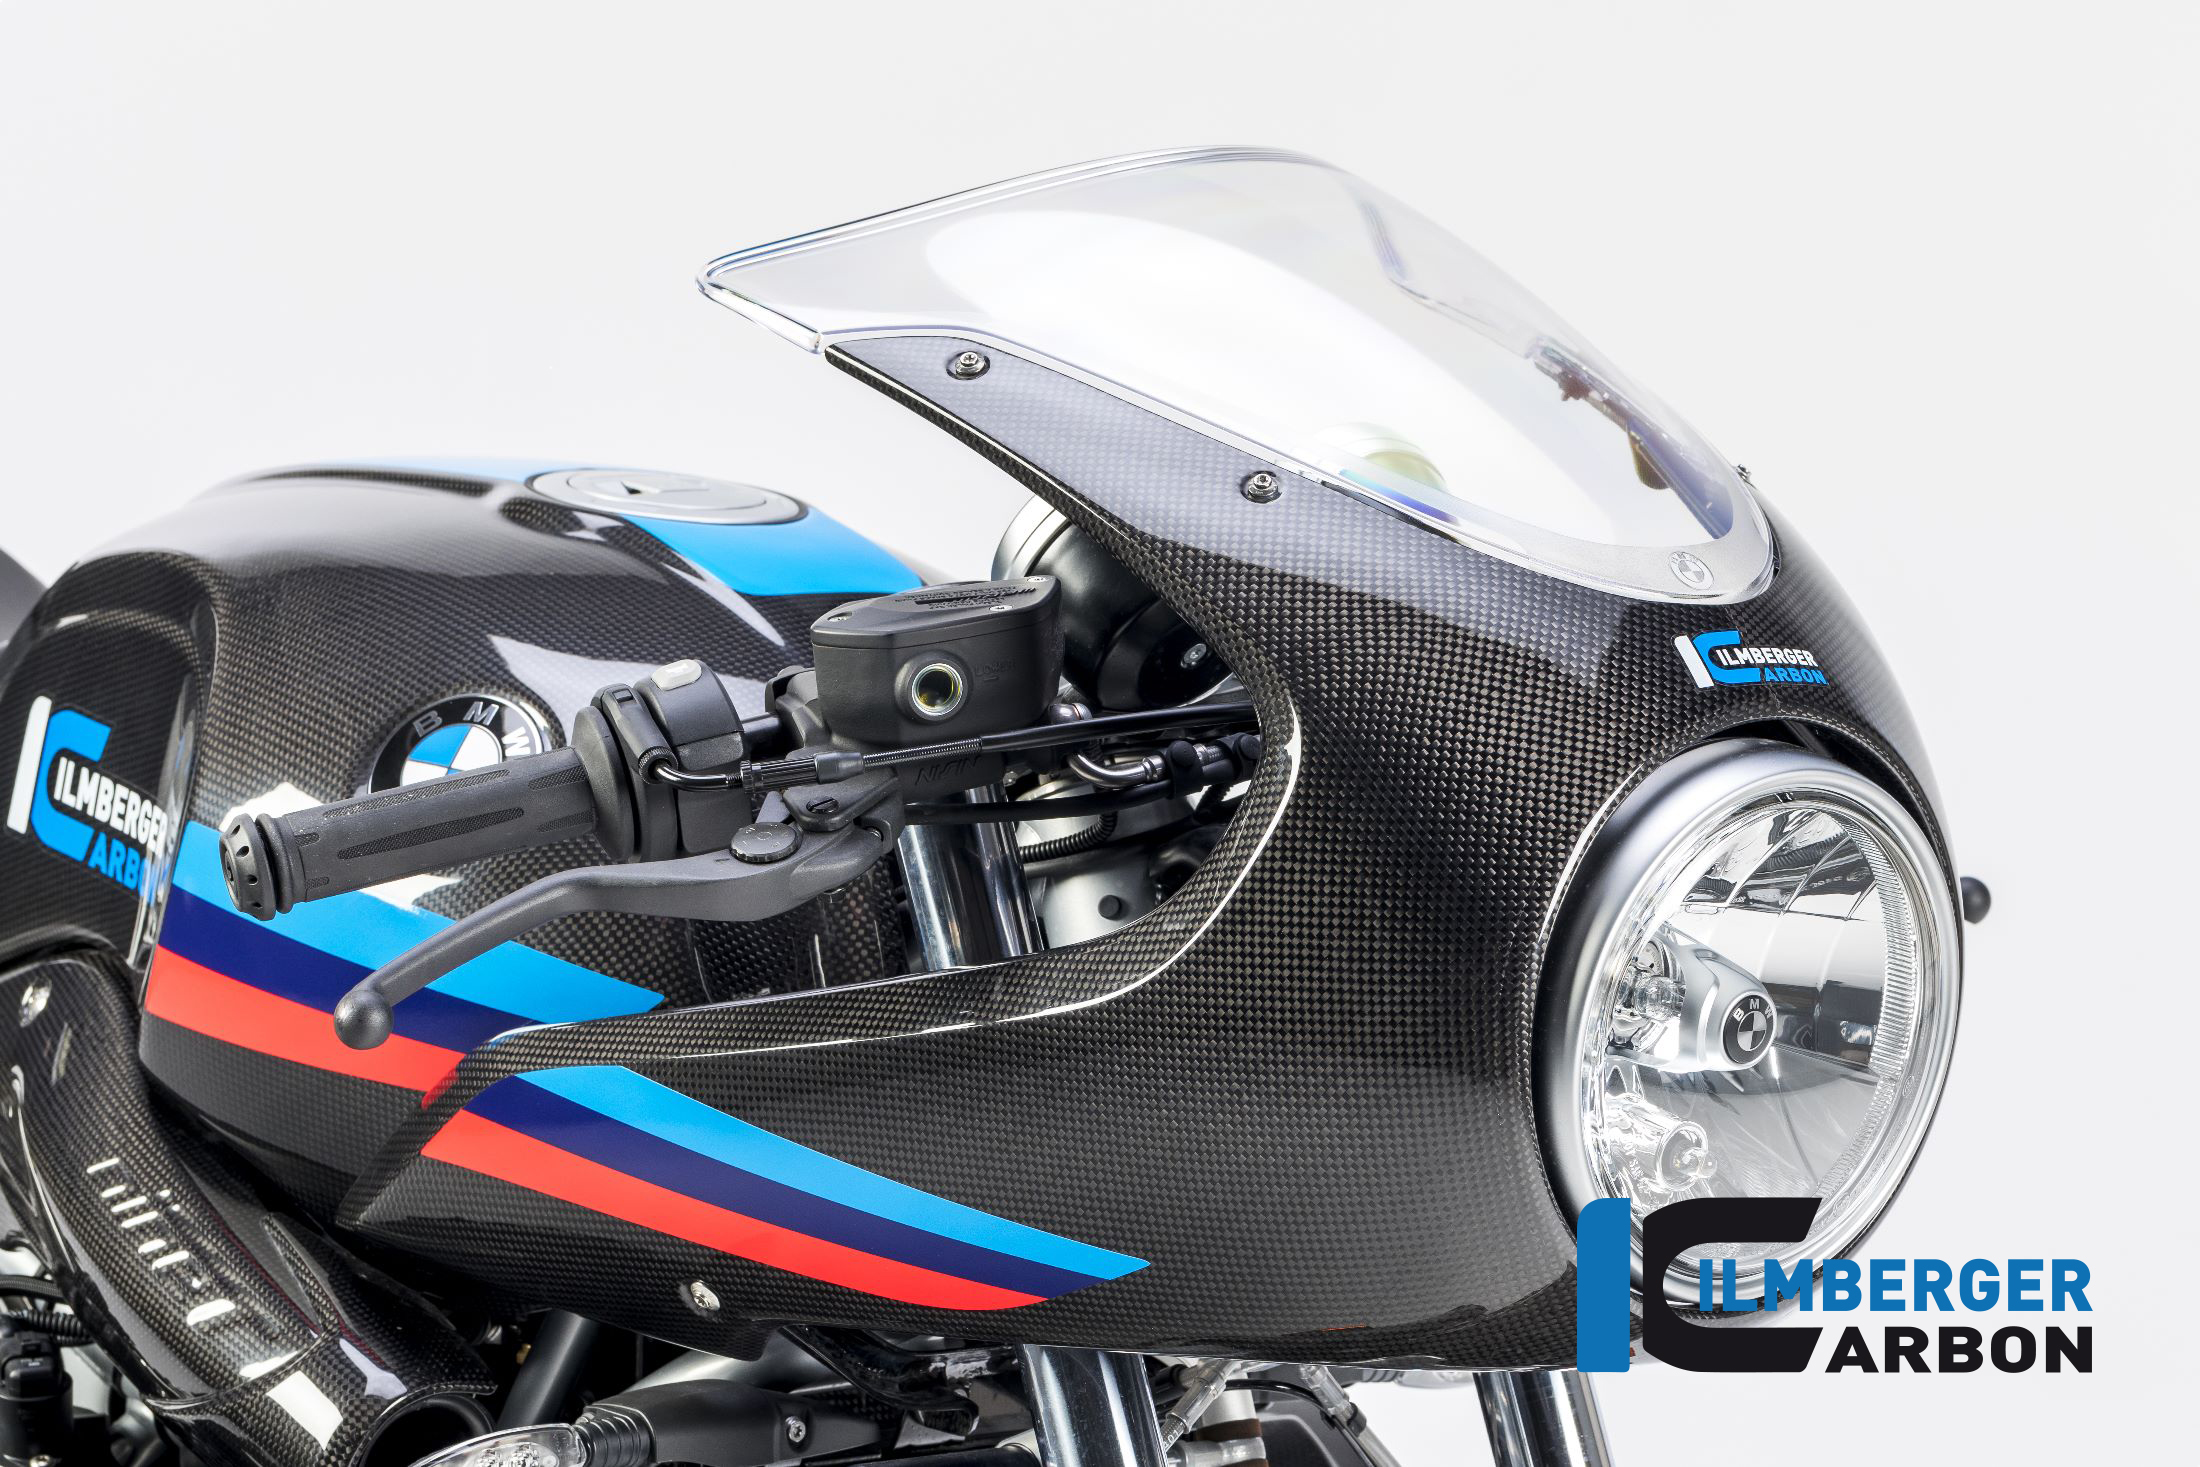 GeGShop.nl - Ilmberger Carbon BMW R9T Racer voorkuip front cowl